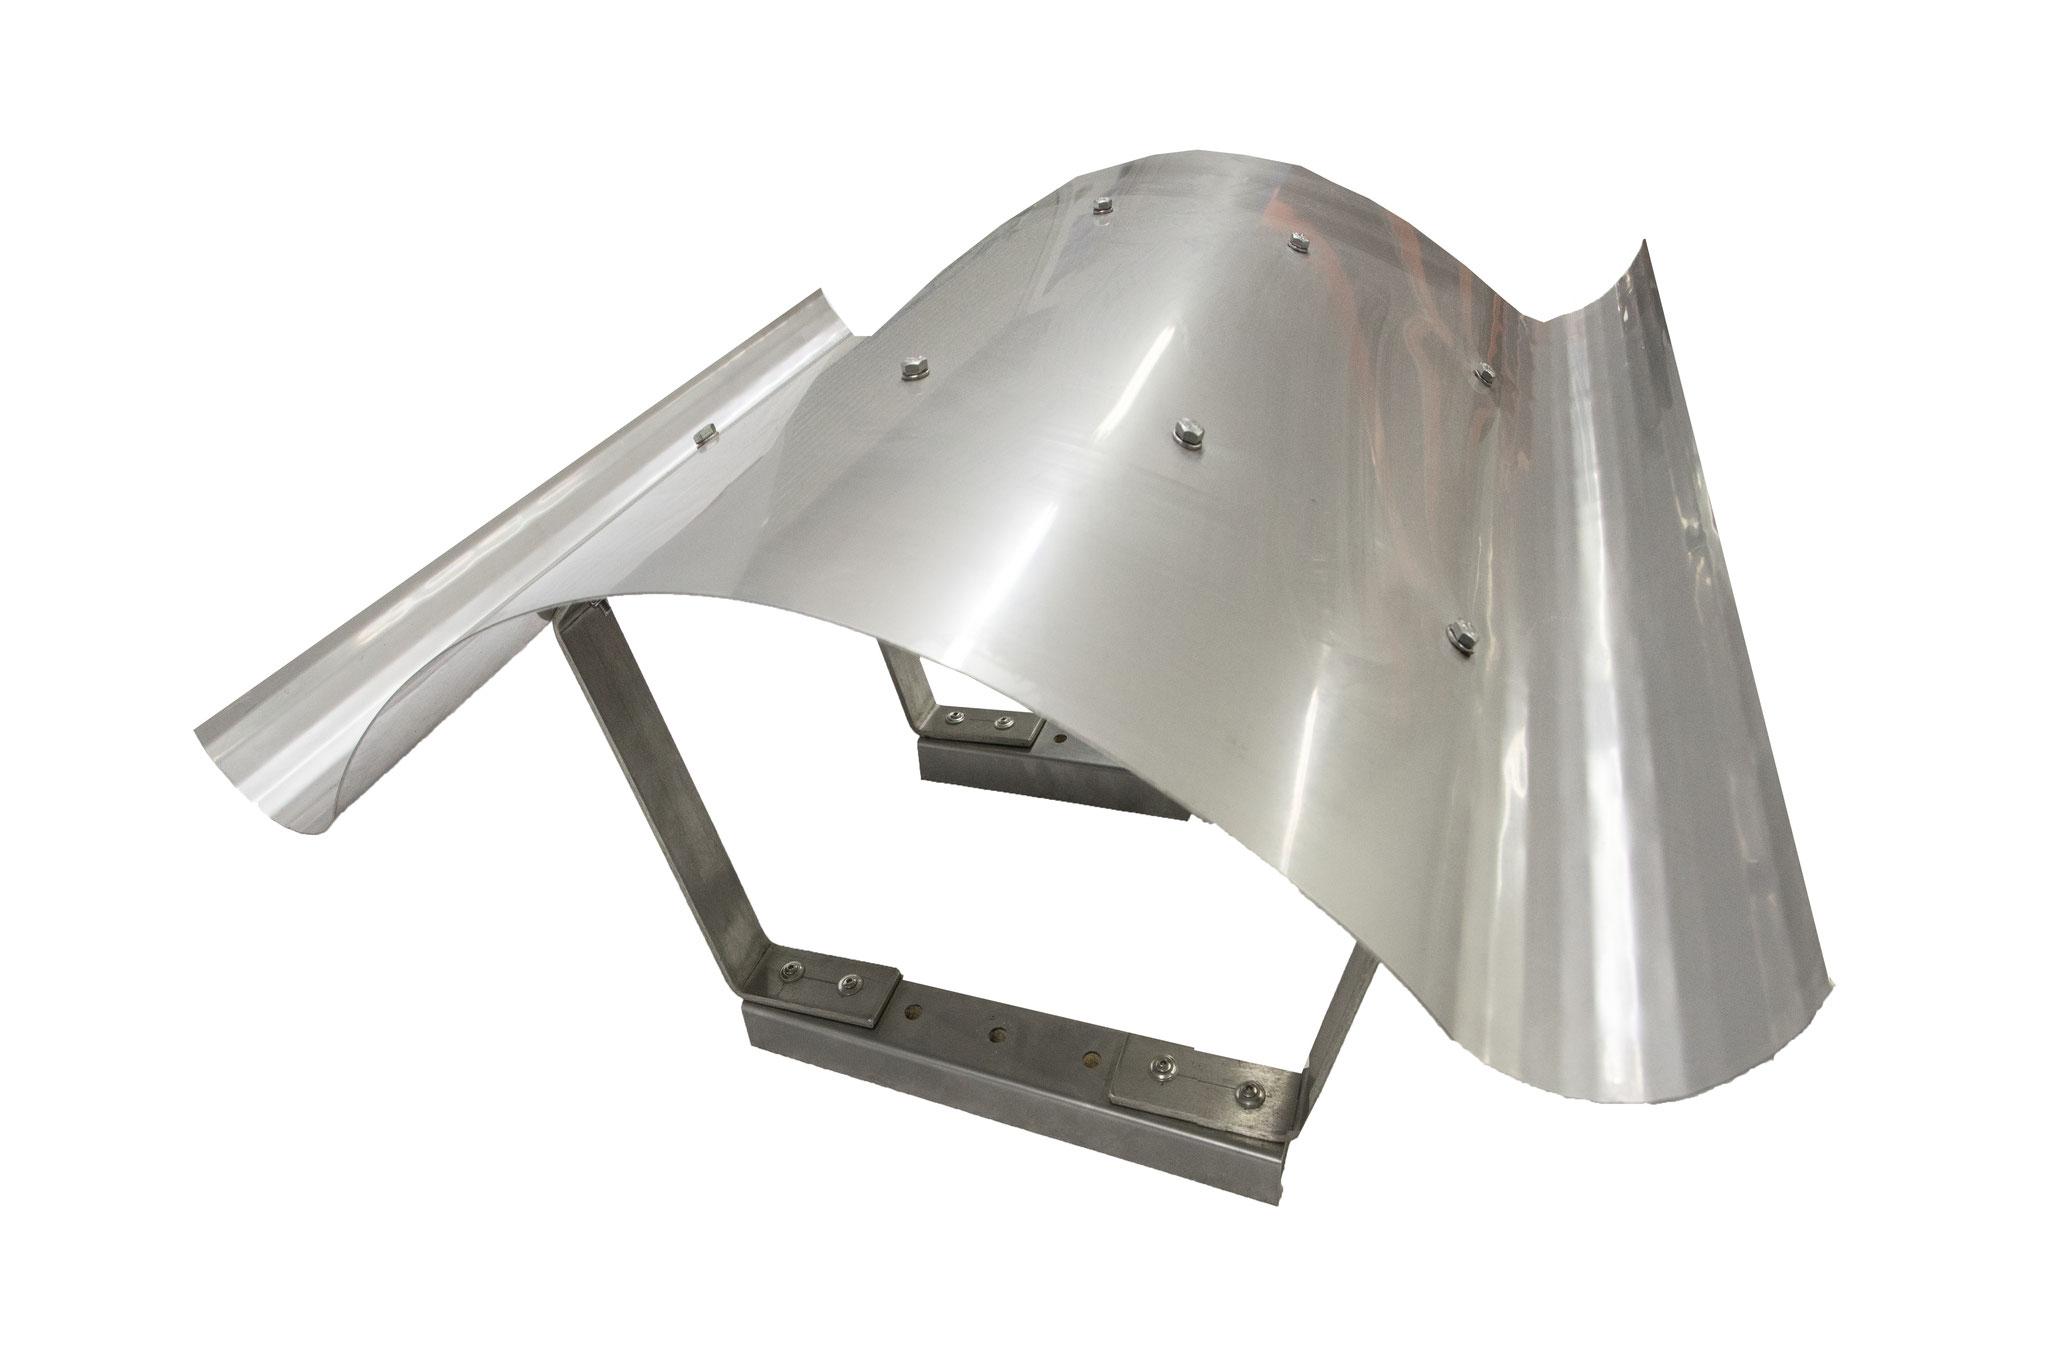 Kaminhaube Form 8 (in VA 1mm stark/in Kupfer 1,5 mm stark)